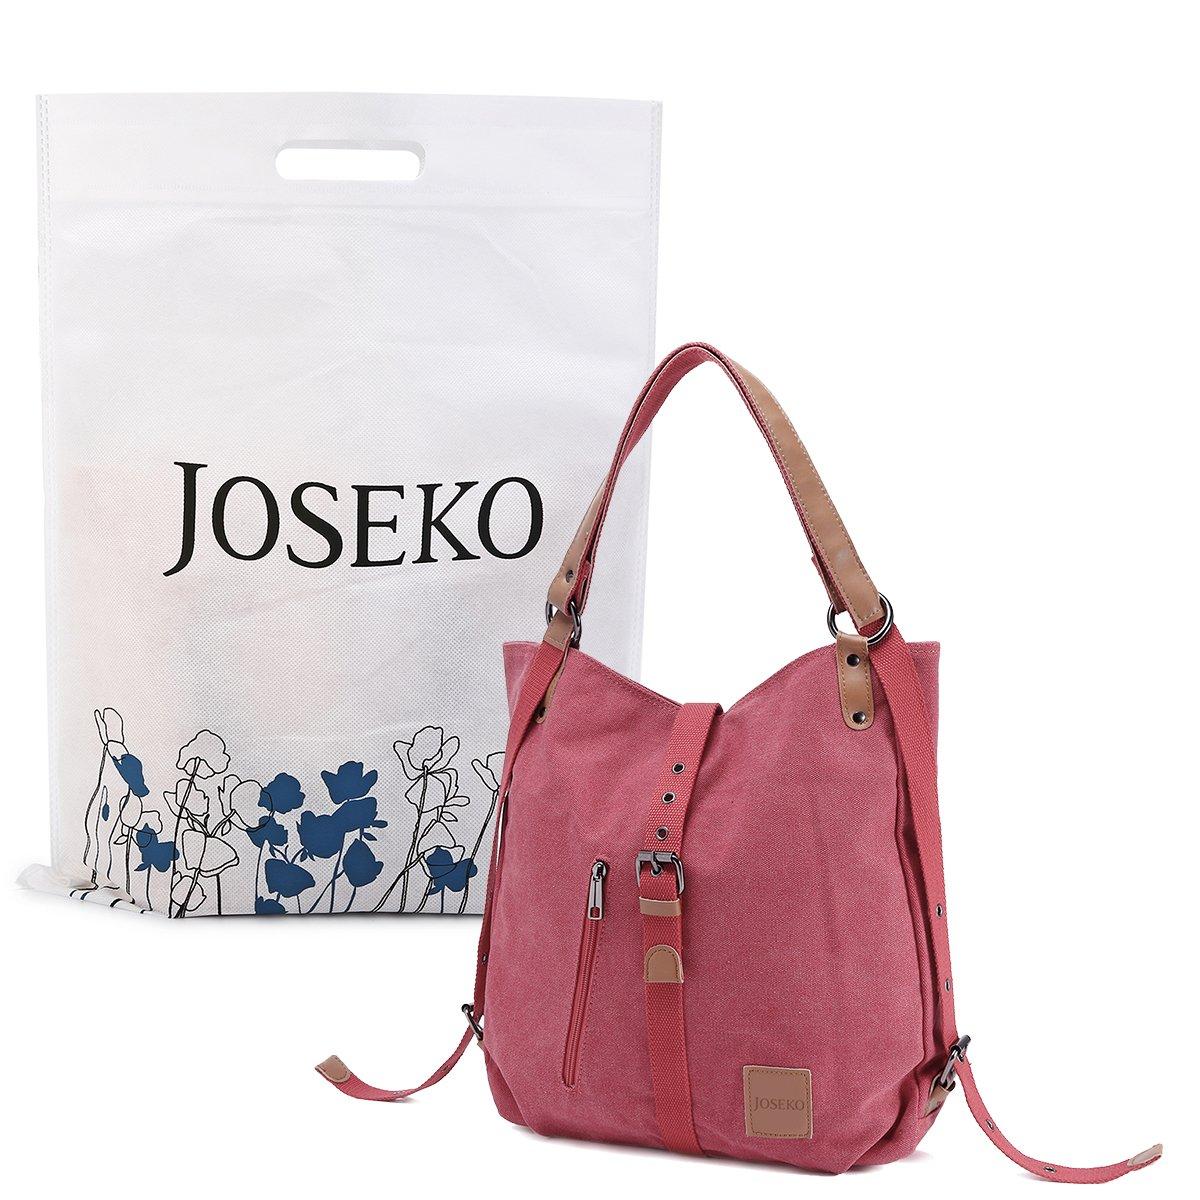 Fashion Shoulder Bag Rucksack, JOSEKO Canvas Rucksack Multifunctional Casual Daily Handbag Travel Backpack for Women Girls Ladies Female Black